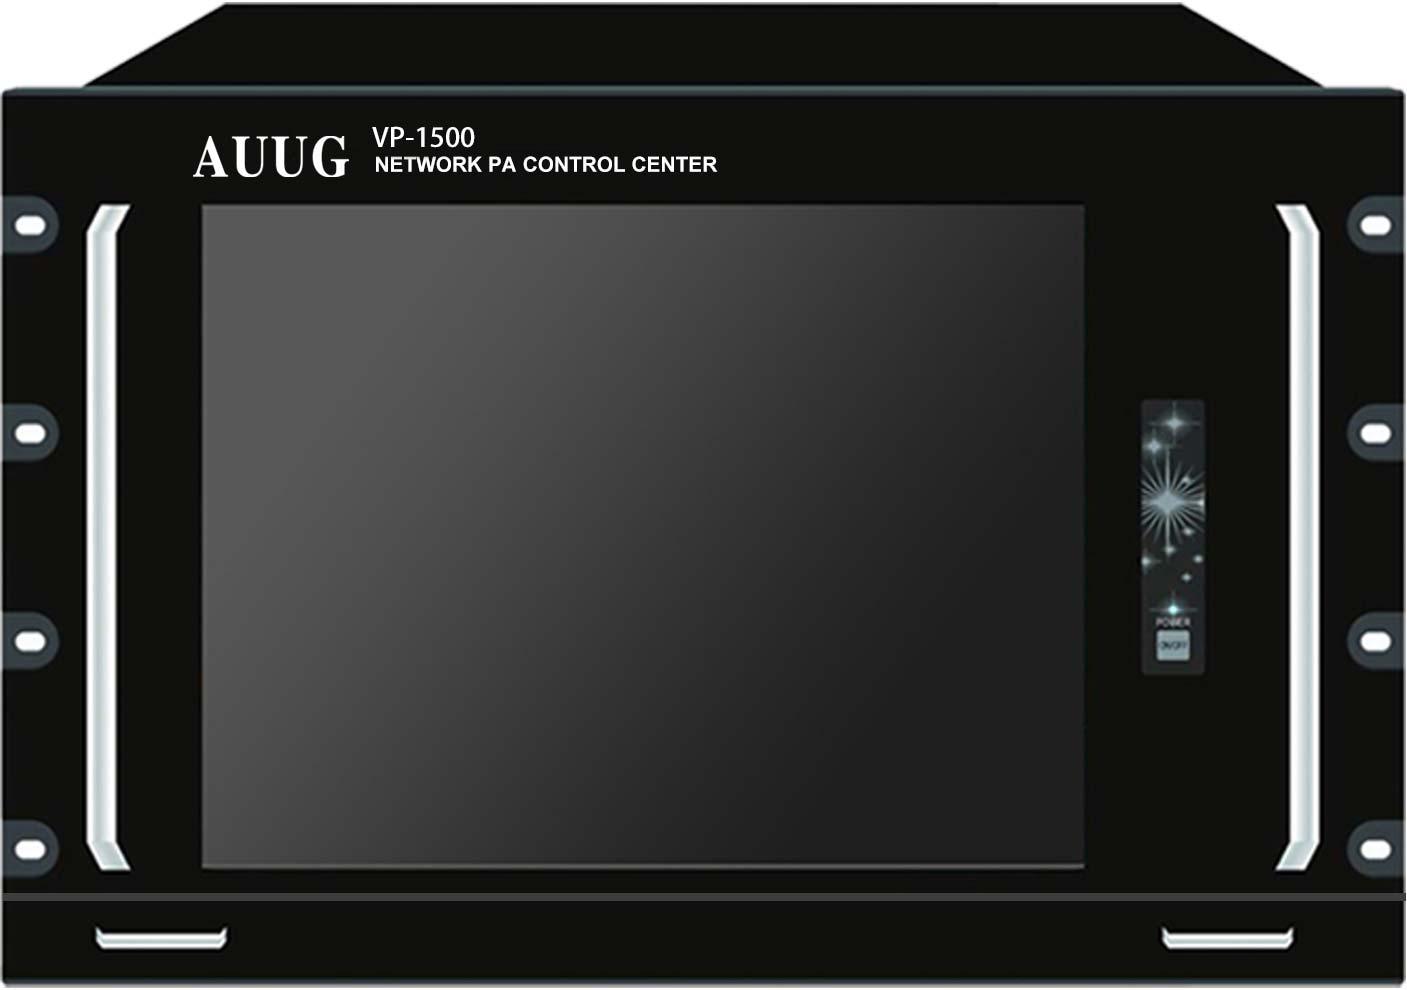 AUUG 网络广播服务器主机 VP-1500